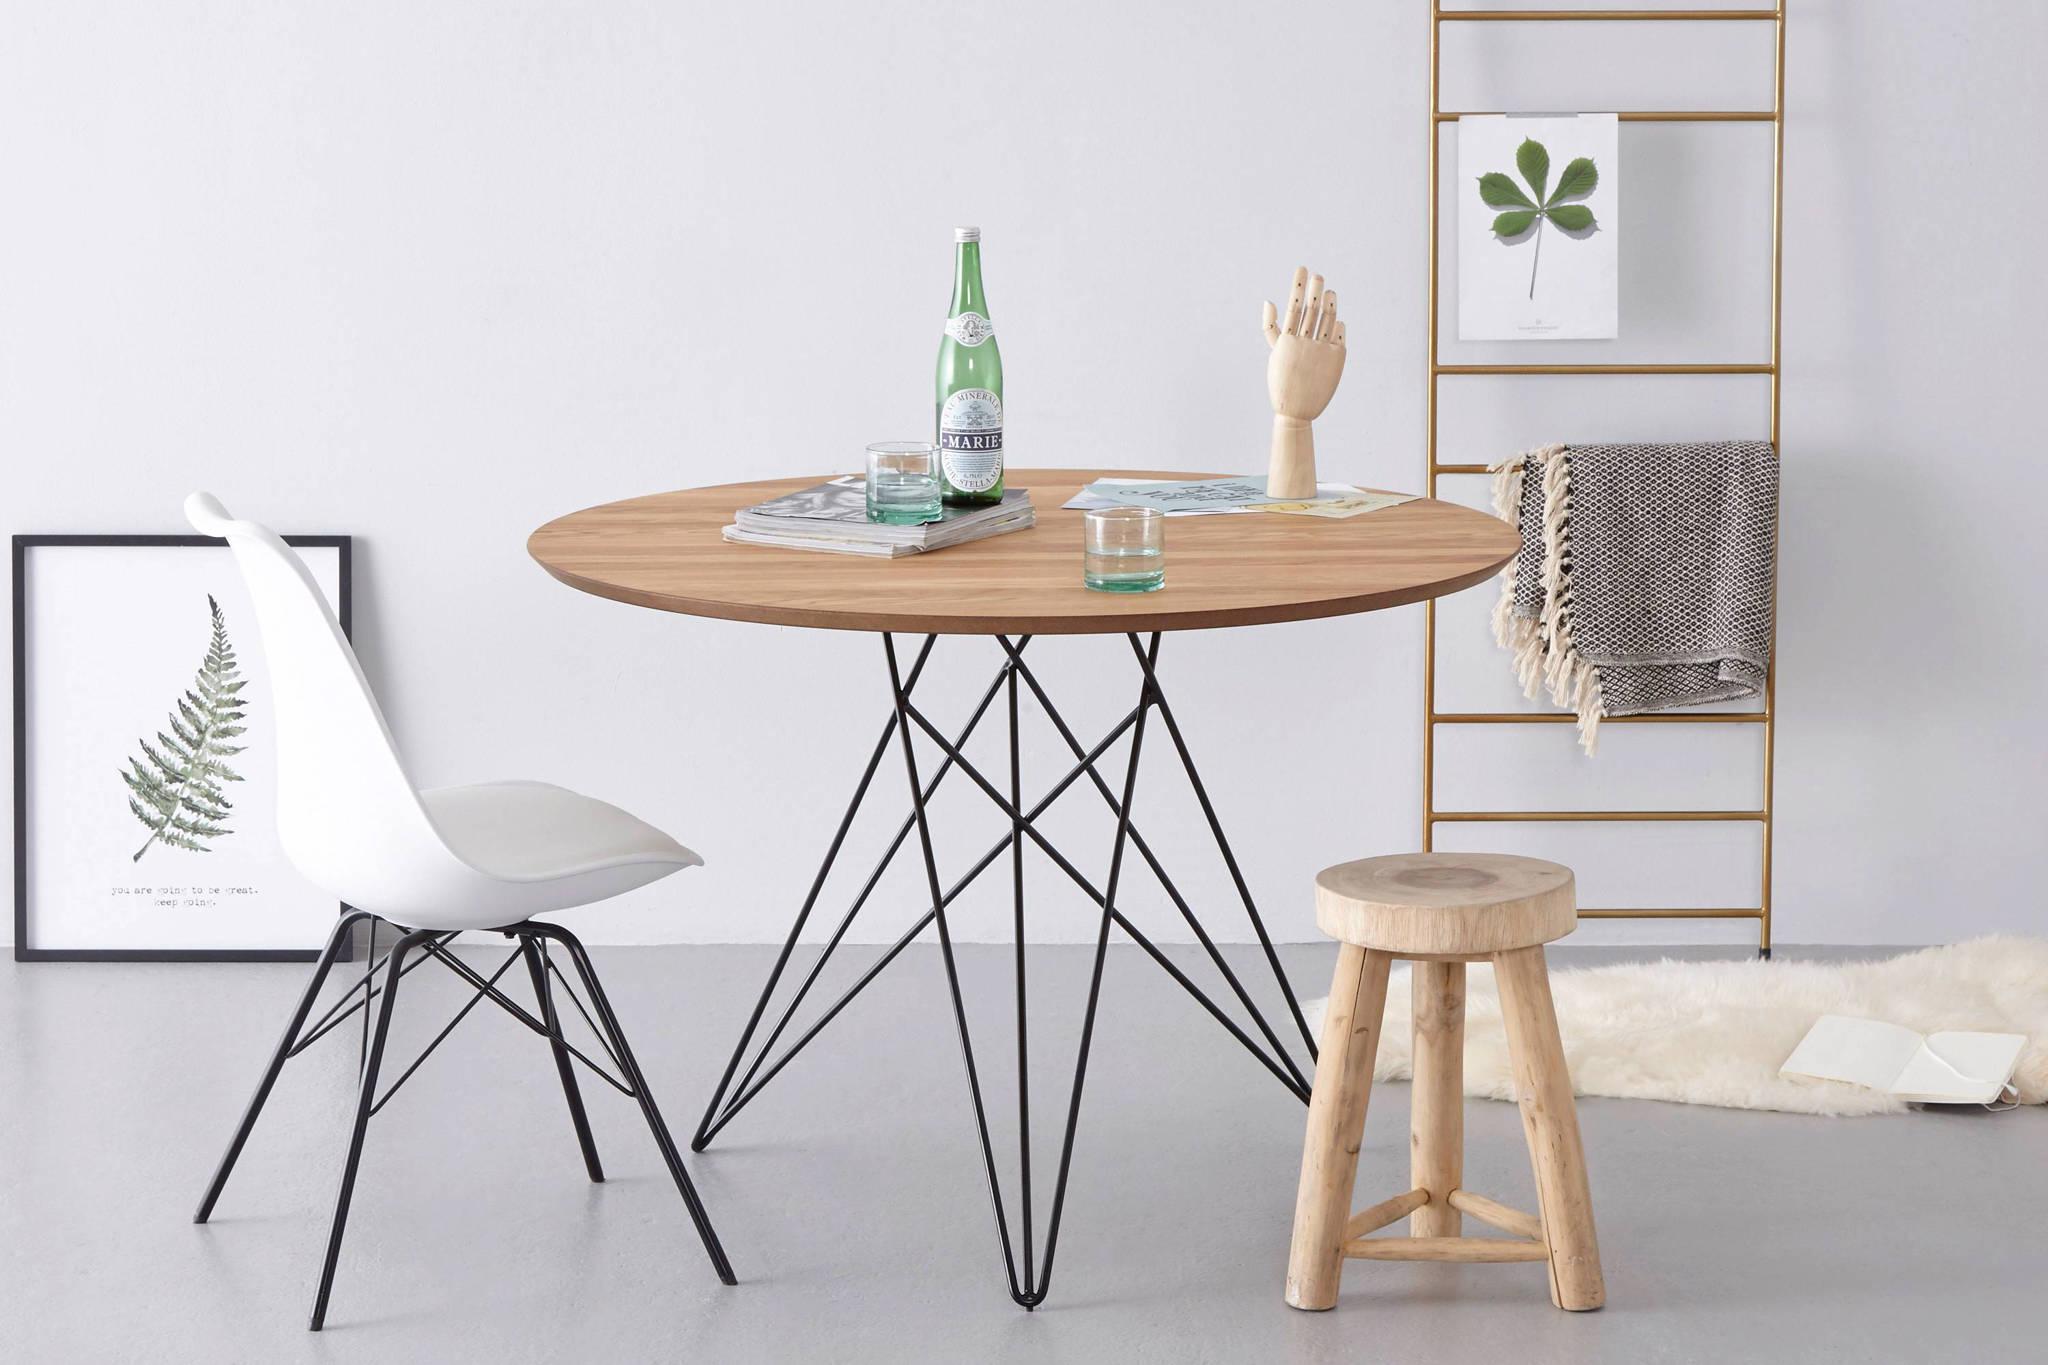 Ronde Eettafel Design.Ronde Eettafel Clara 110 Cm